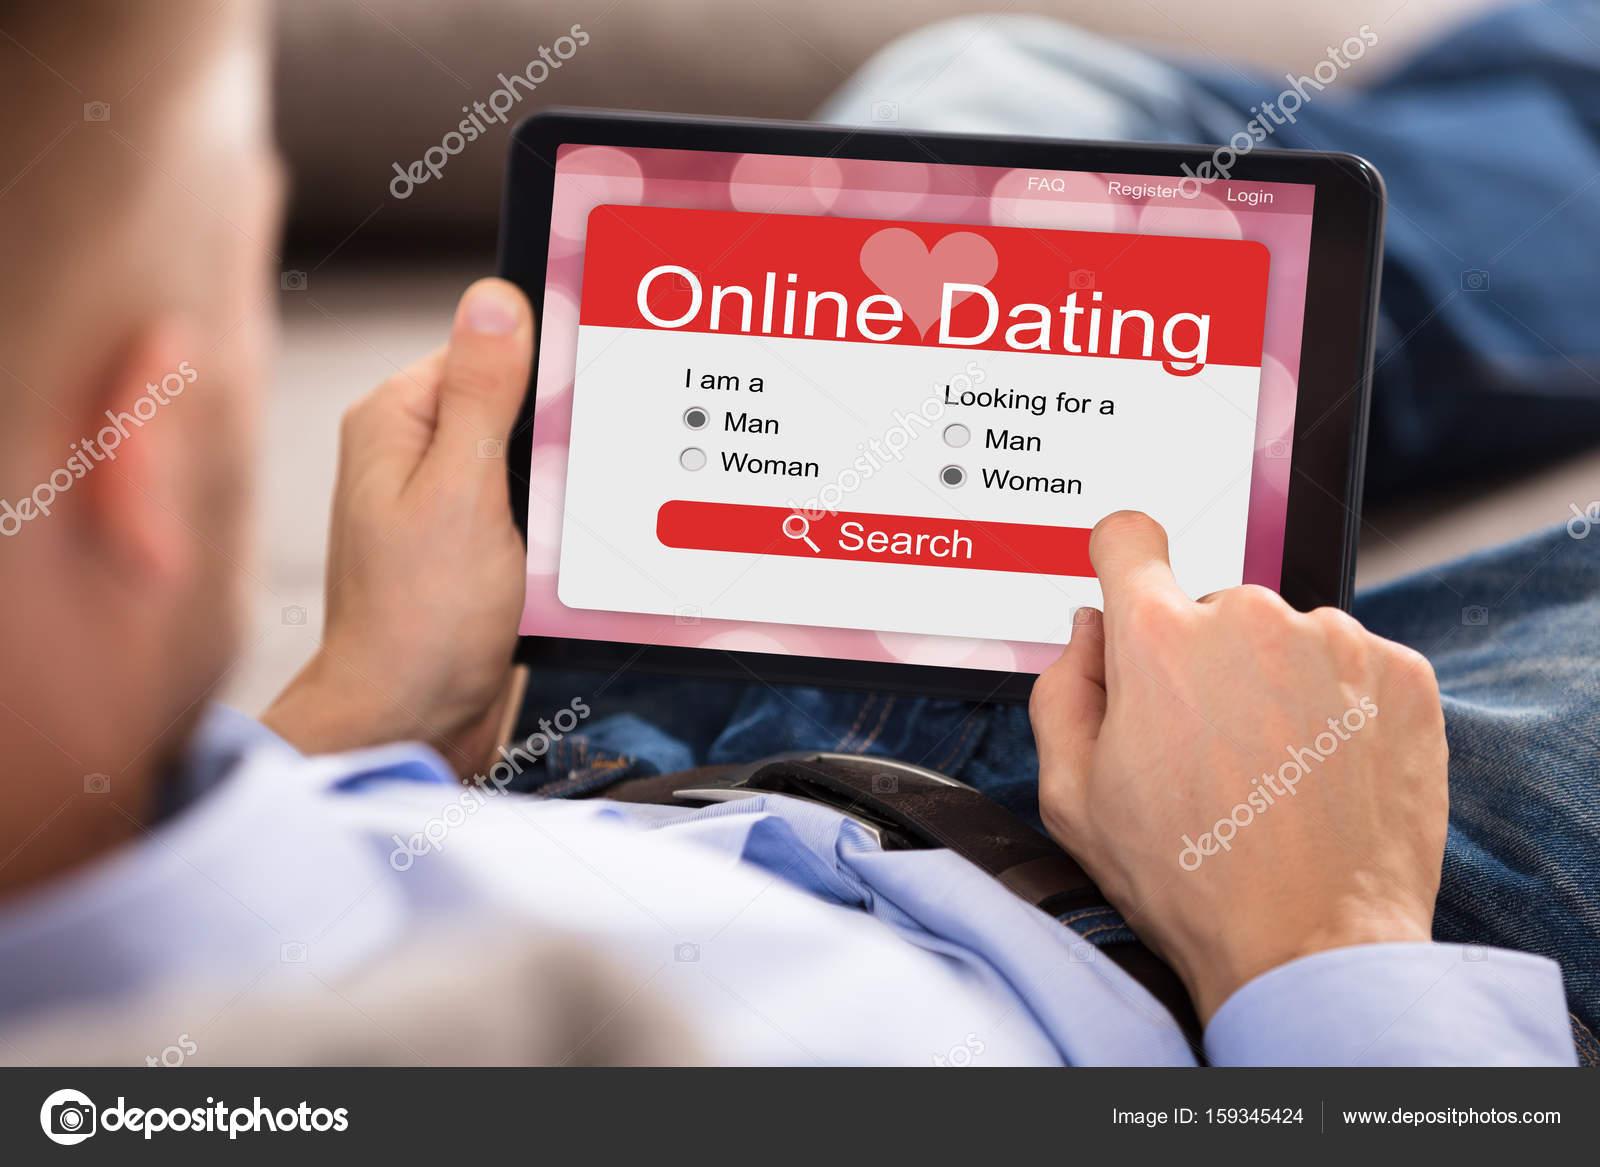 Mervyn bunter online dating